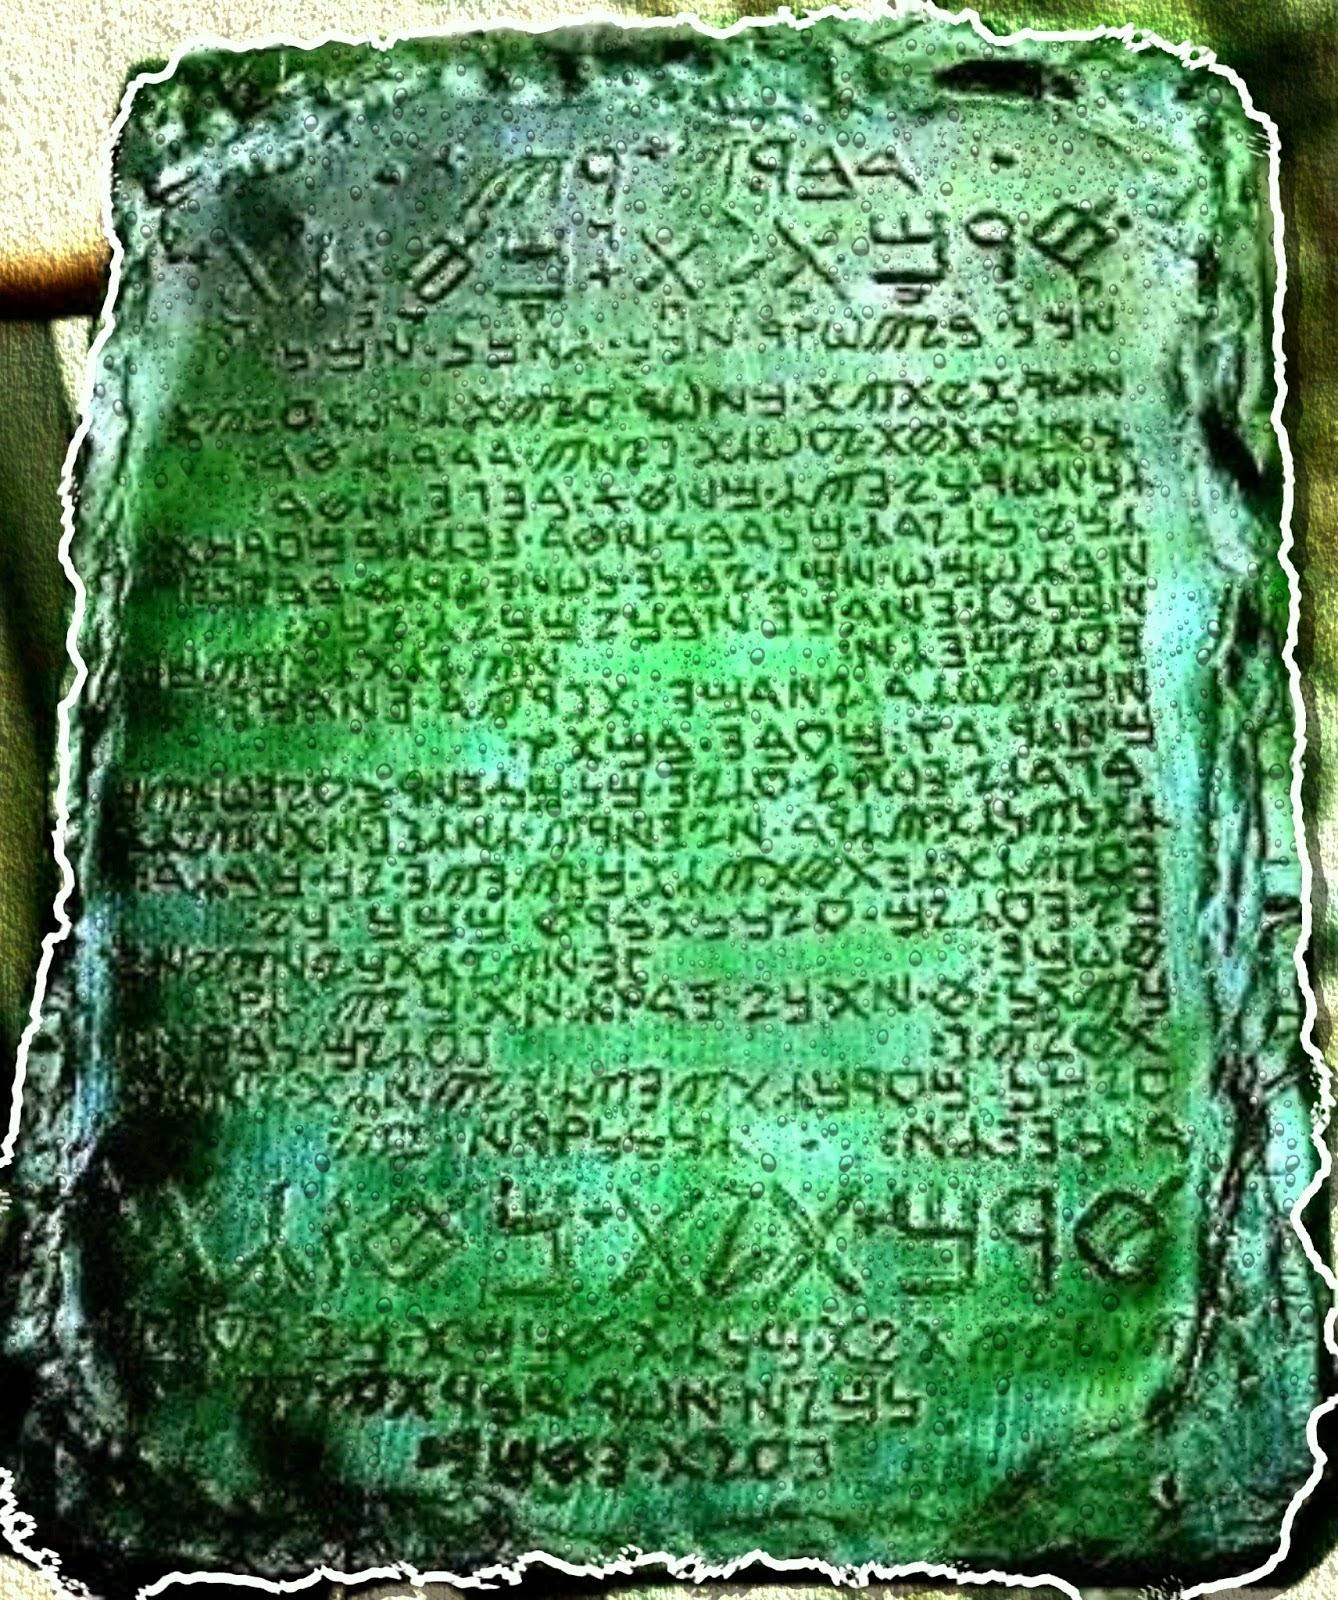 La misteriosa tabla esmeralda